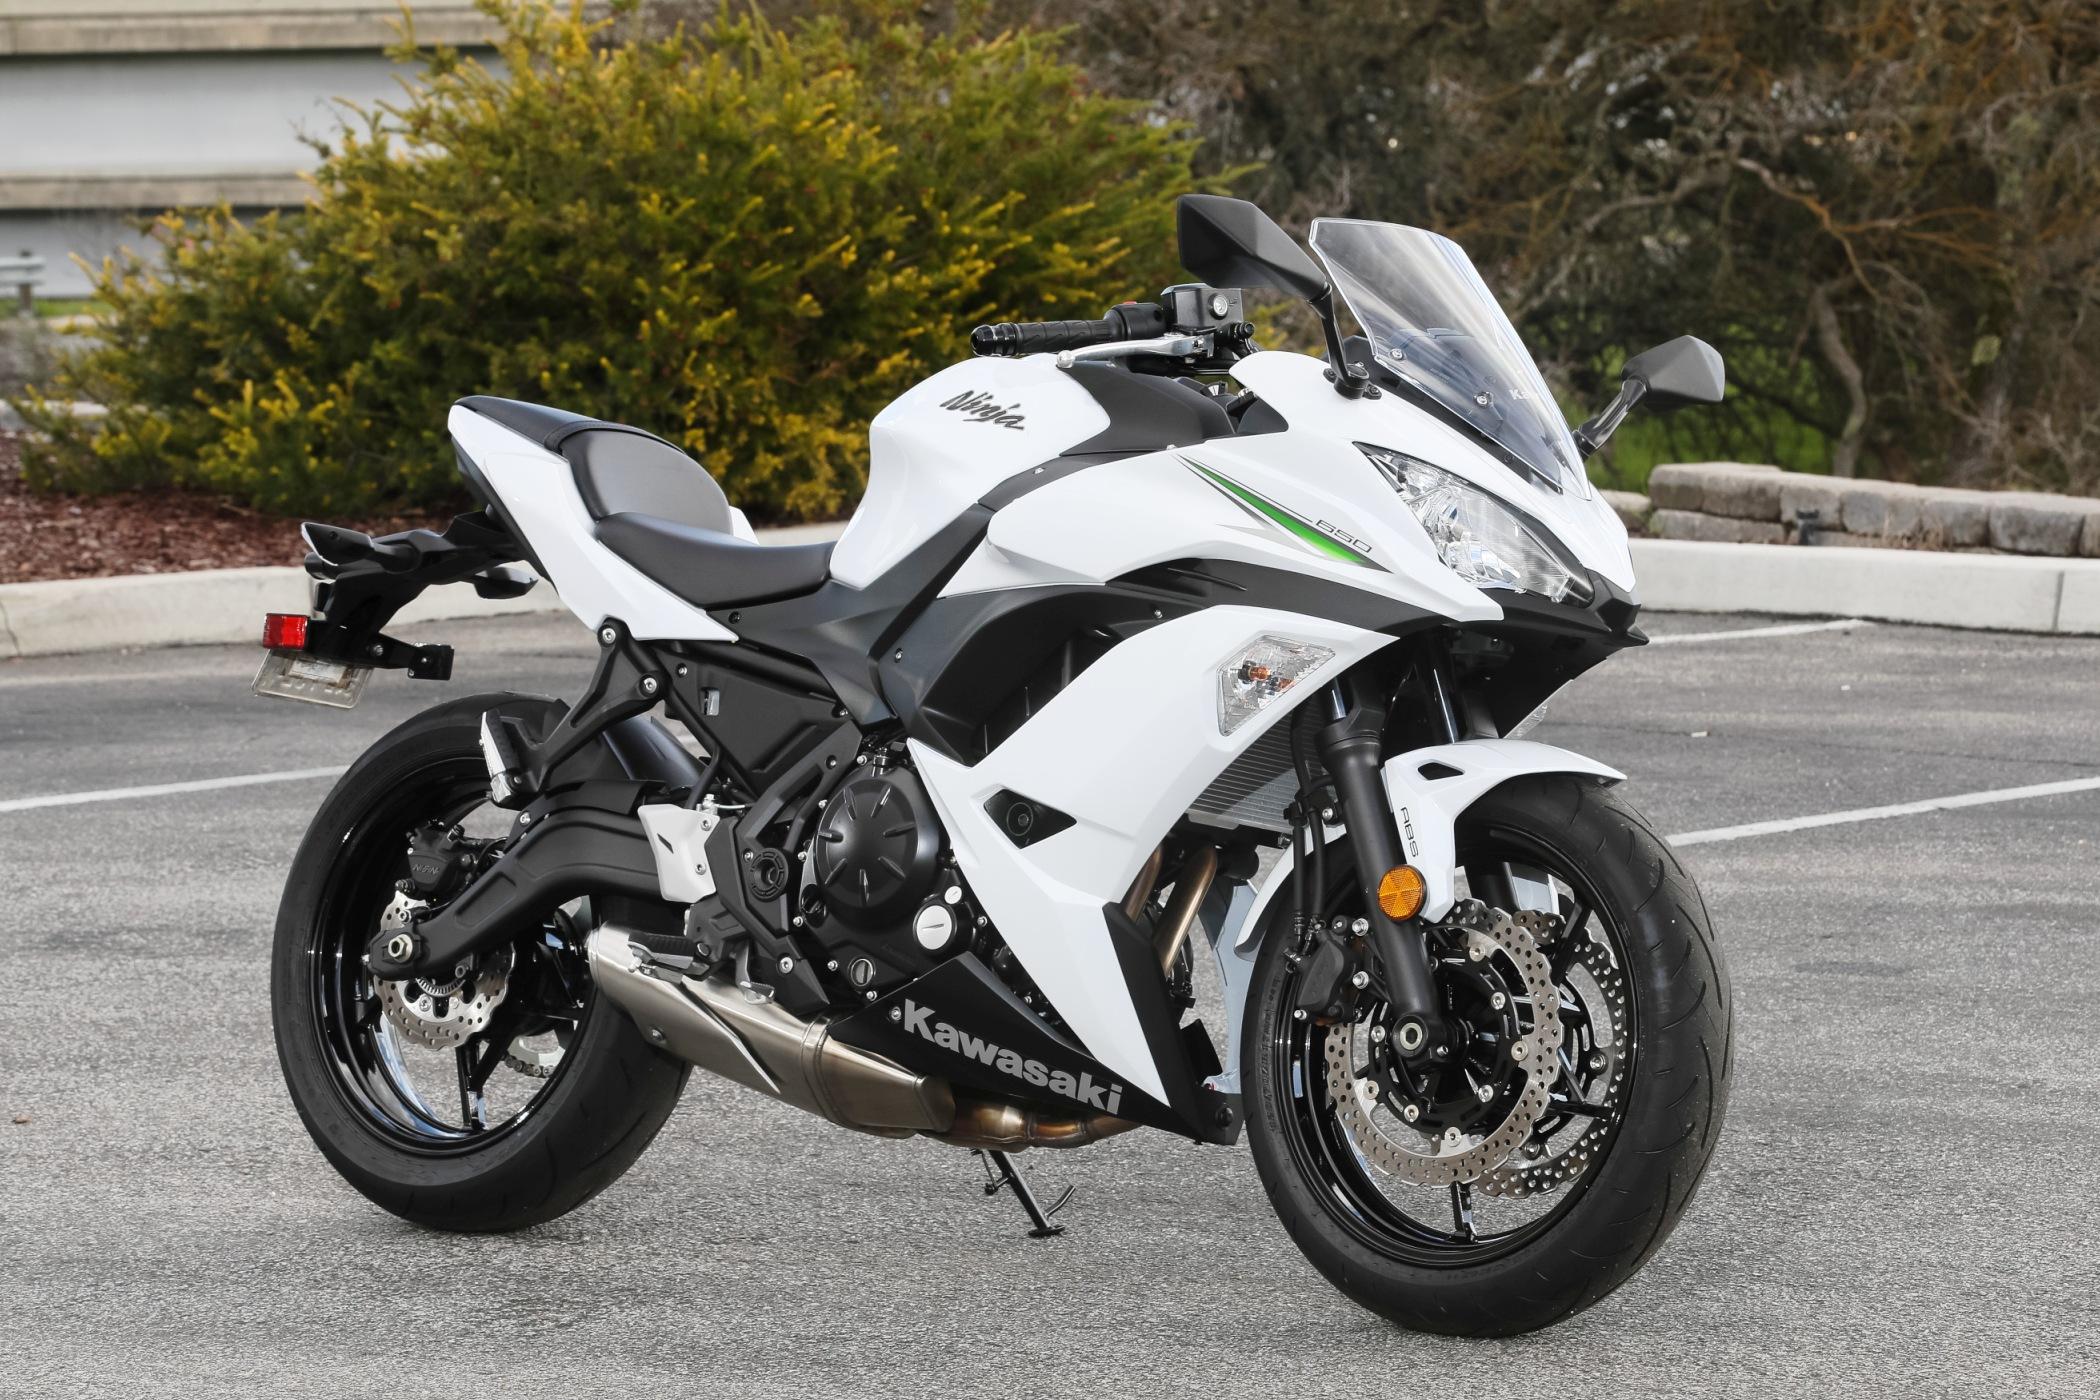 2009 Kawasaki Ninja 650r Cafe Racer 1stmotorxstyleorg